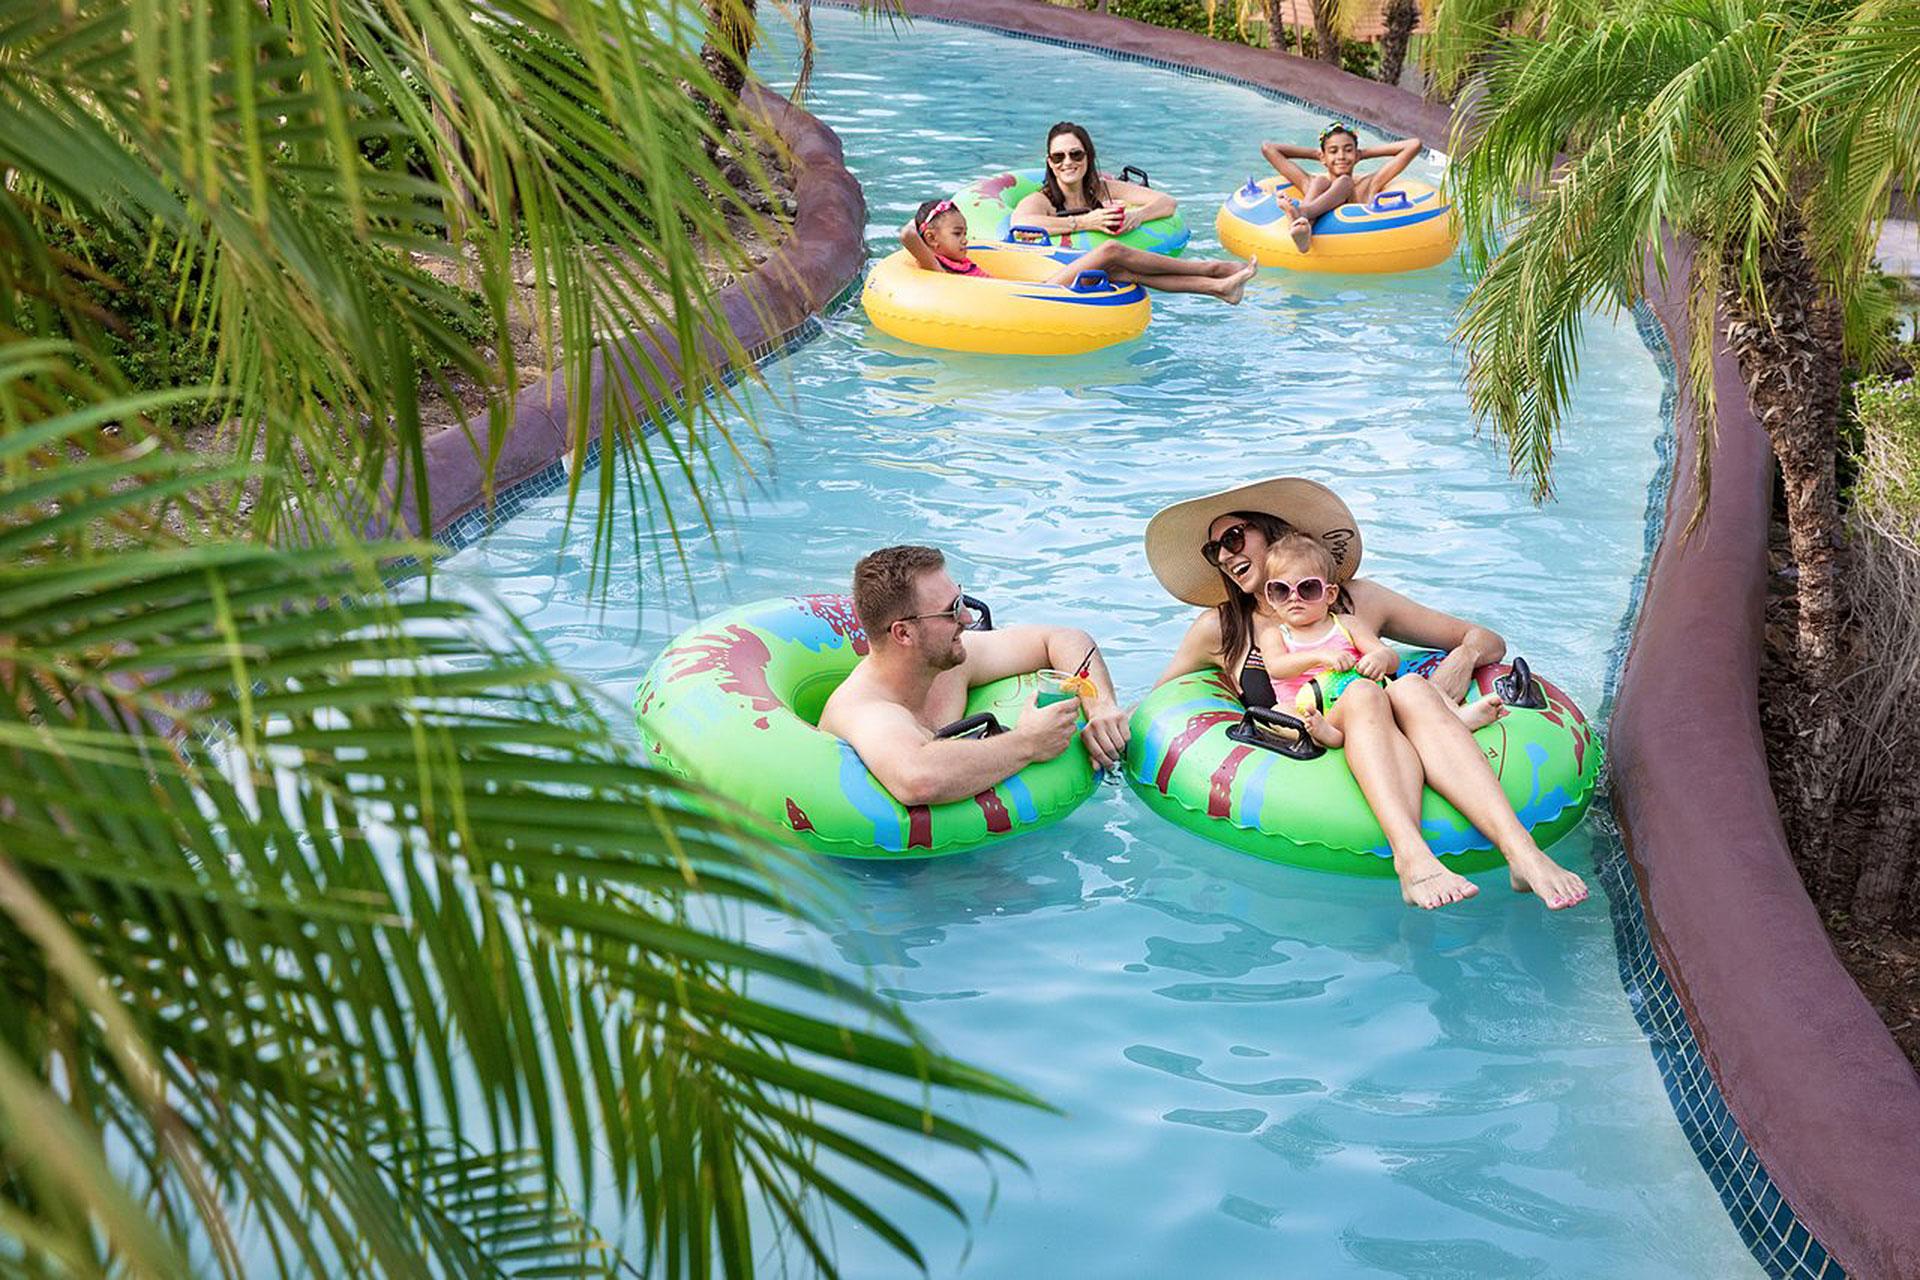 Lazy River at Pointe Hilton Squaw Peak Resort in Phoenix; Courtesy of Pointe Hilton Squaw Peak Resort